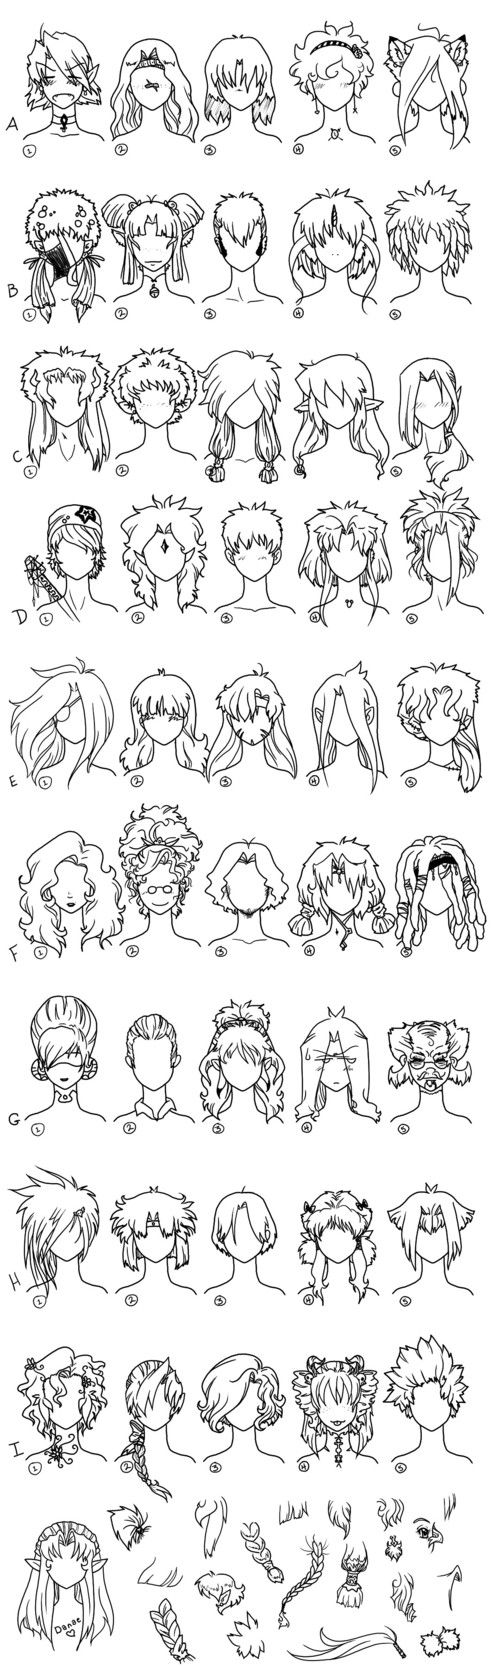 Autoportrait La Classe D Irys How To Draw Hair Anime Hair Anime Drawings